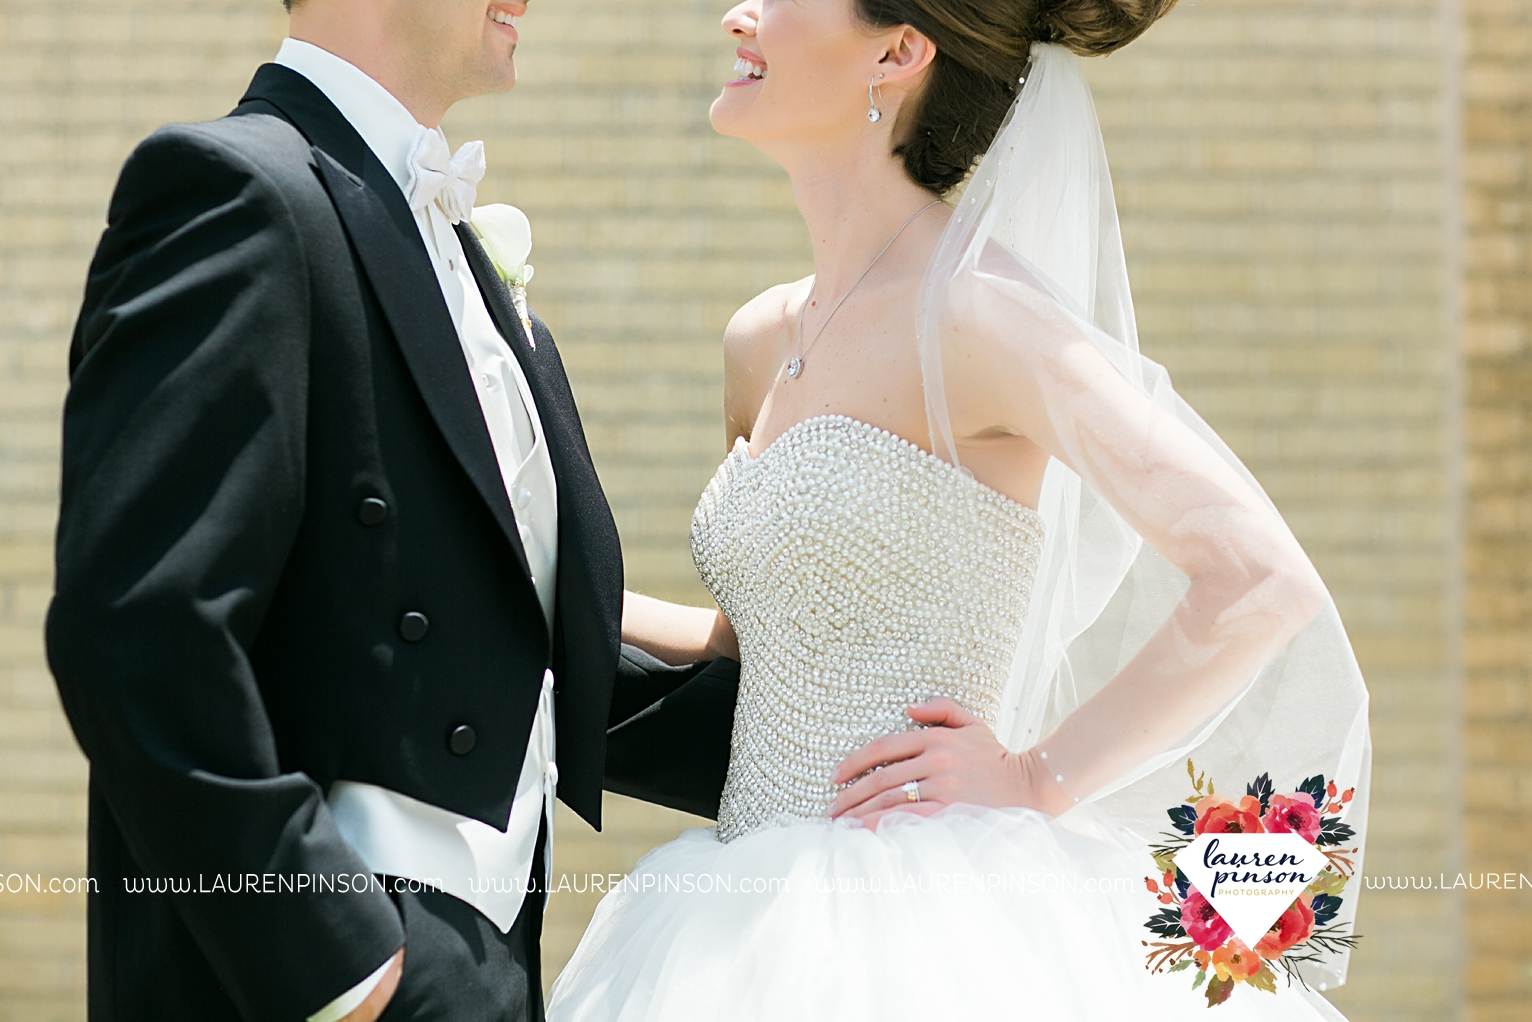 wichita-falls-texas-wedding-photographer-the-forum-by-the-kemp-mayfield-events-ulta-gold-glitter_2837.jpg